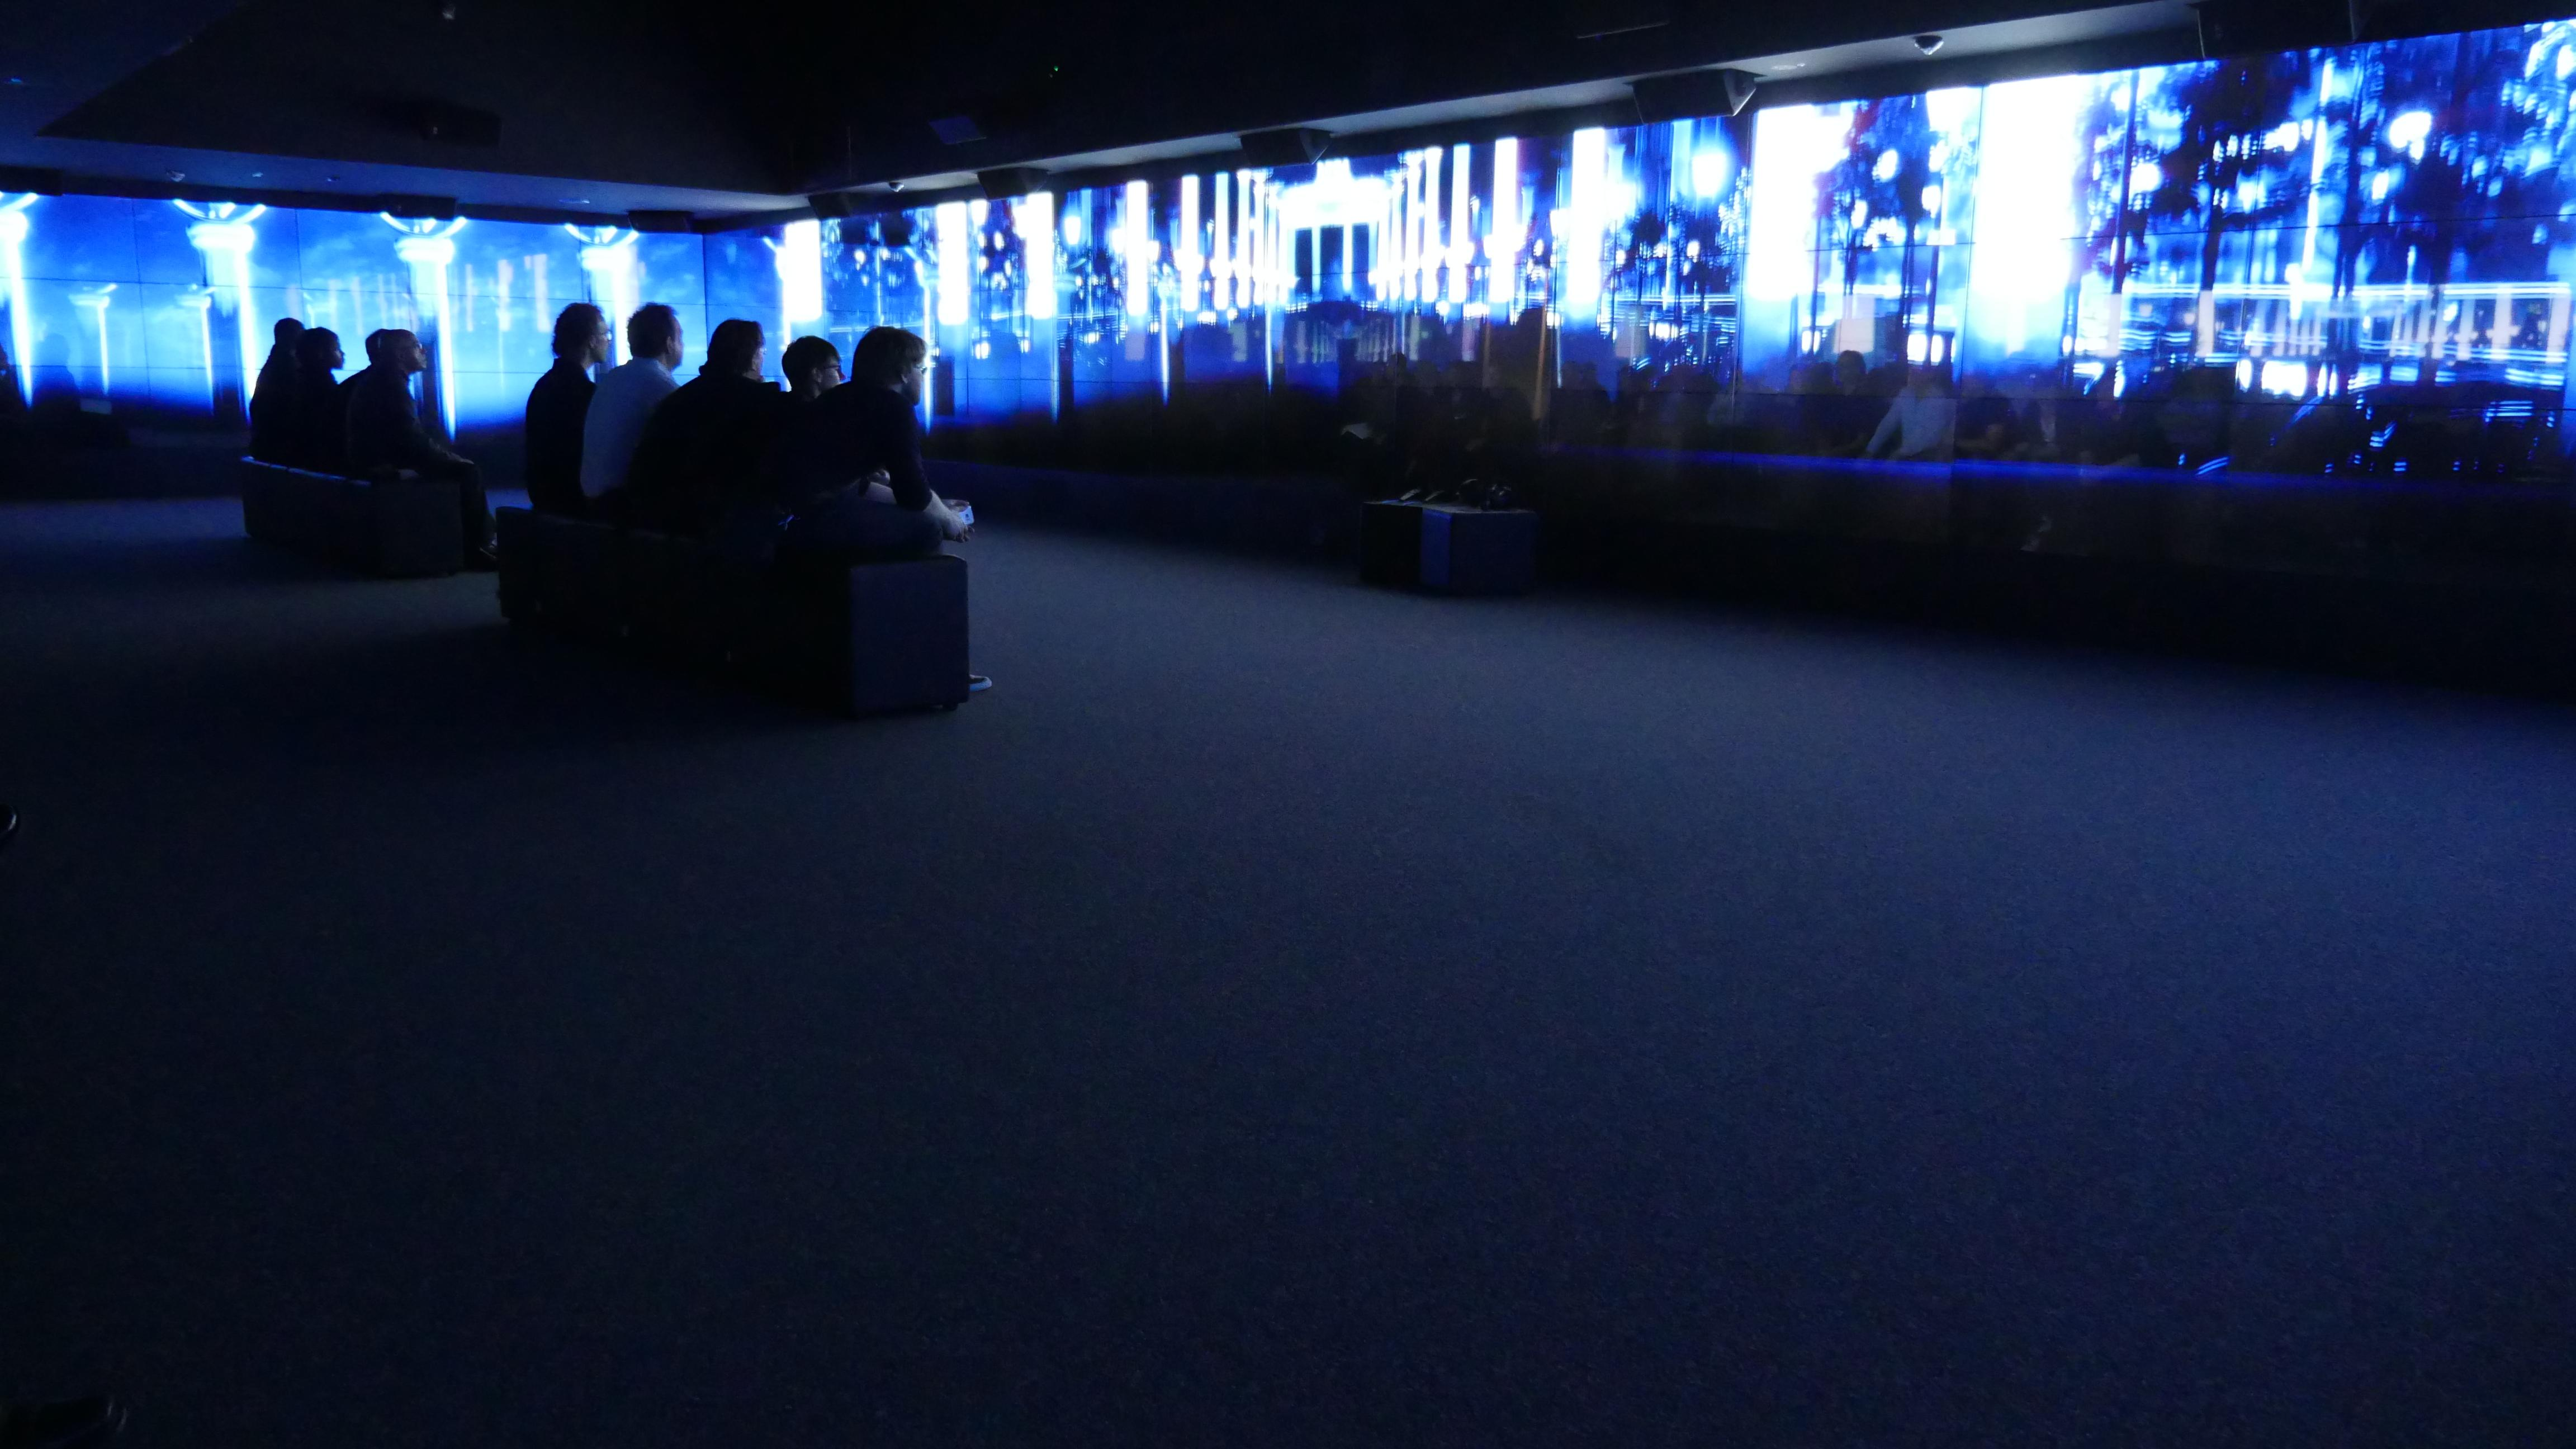 photo: videowall screens at the Brandenburg Gate Museum using 87 screens of Panasonic's